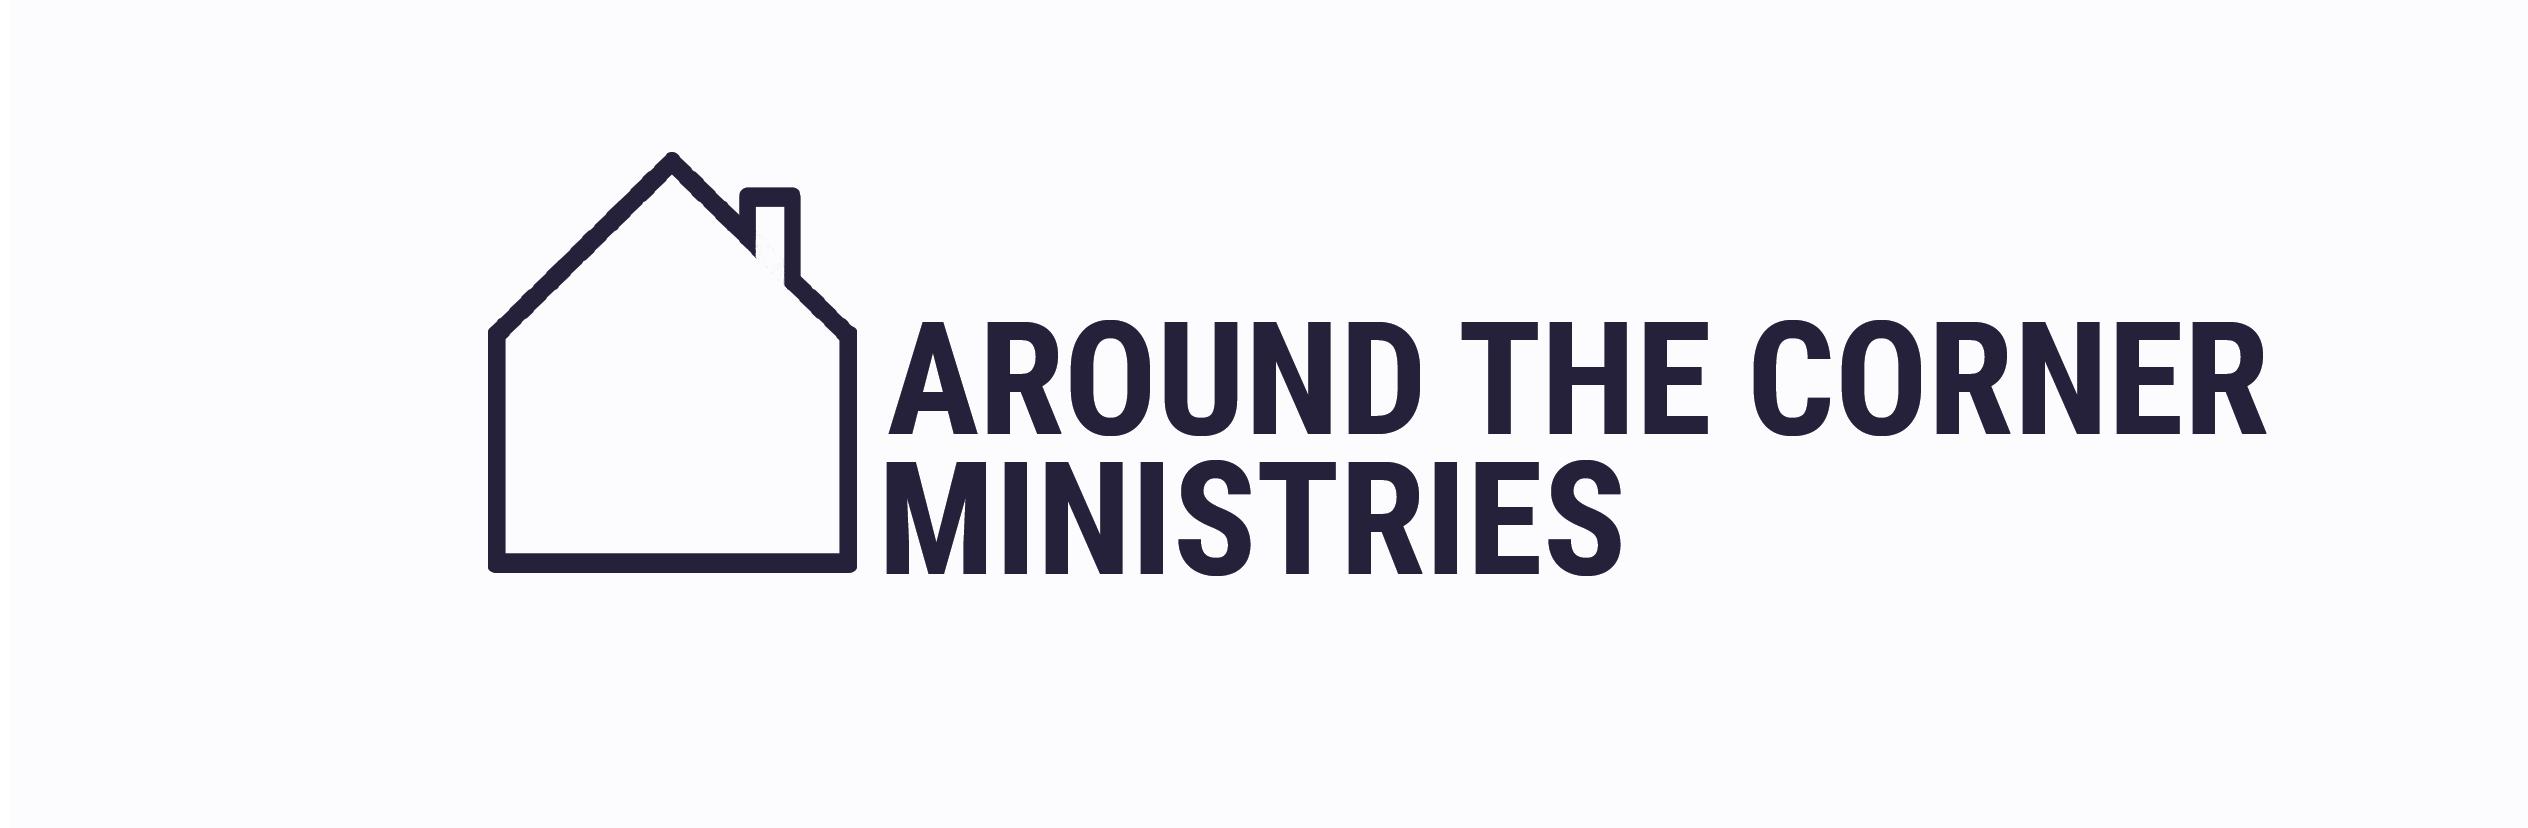 Around the Corner Ministries